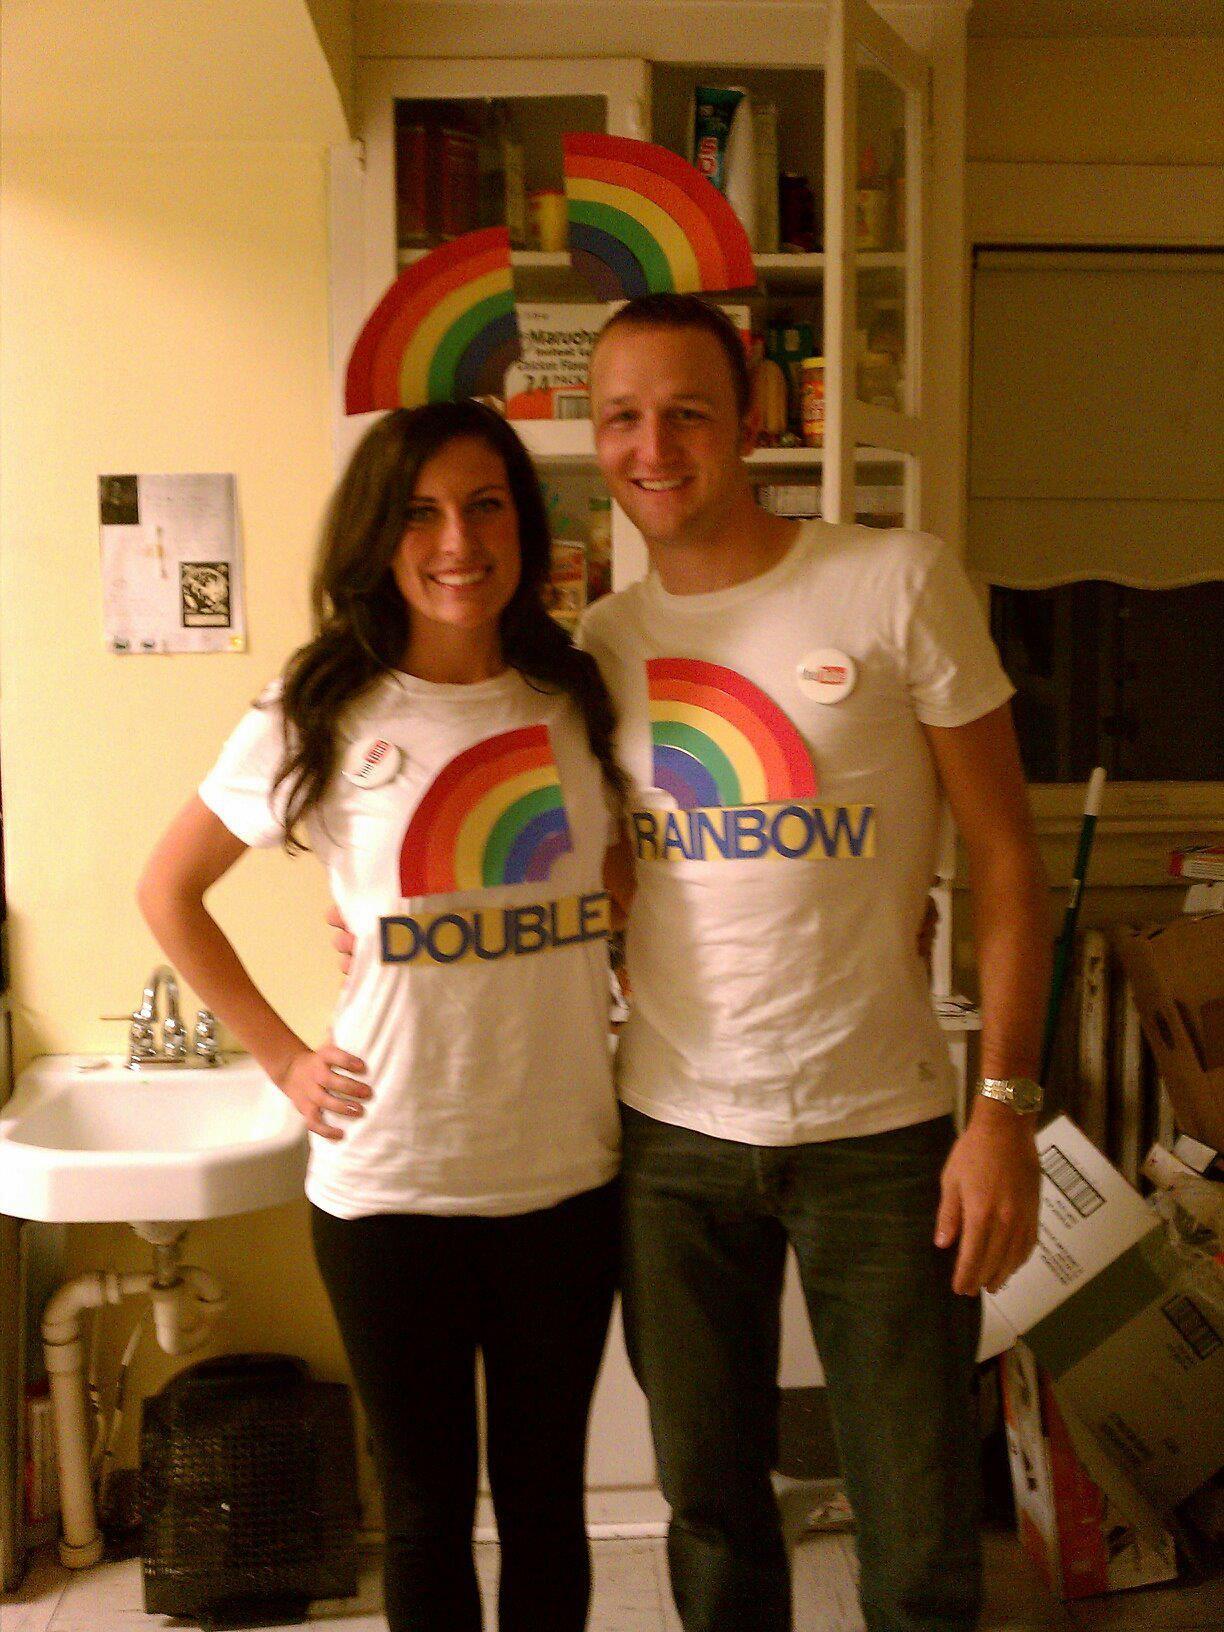 Couples Halloween Costume Double Rainbow (see youtube